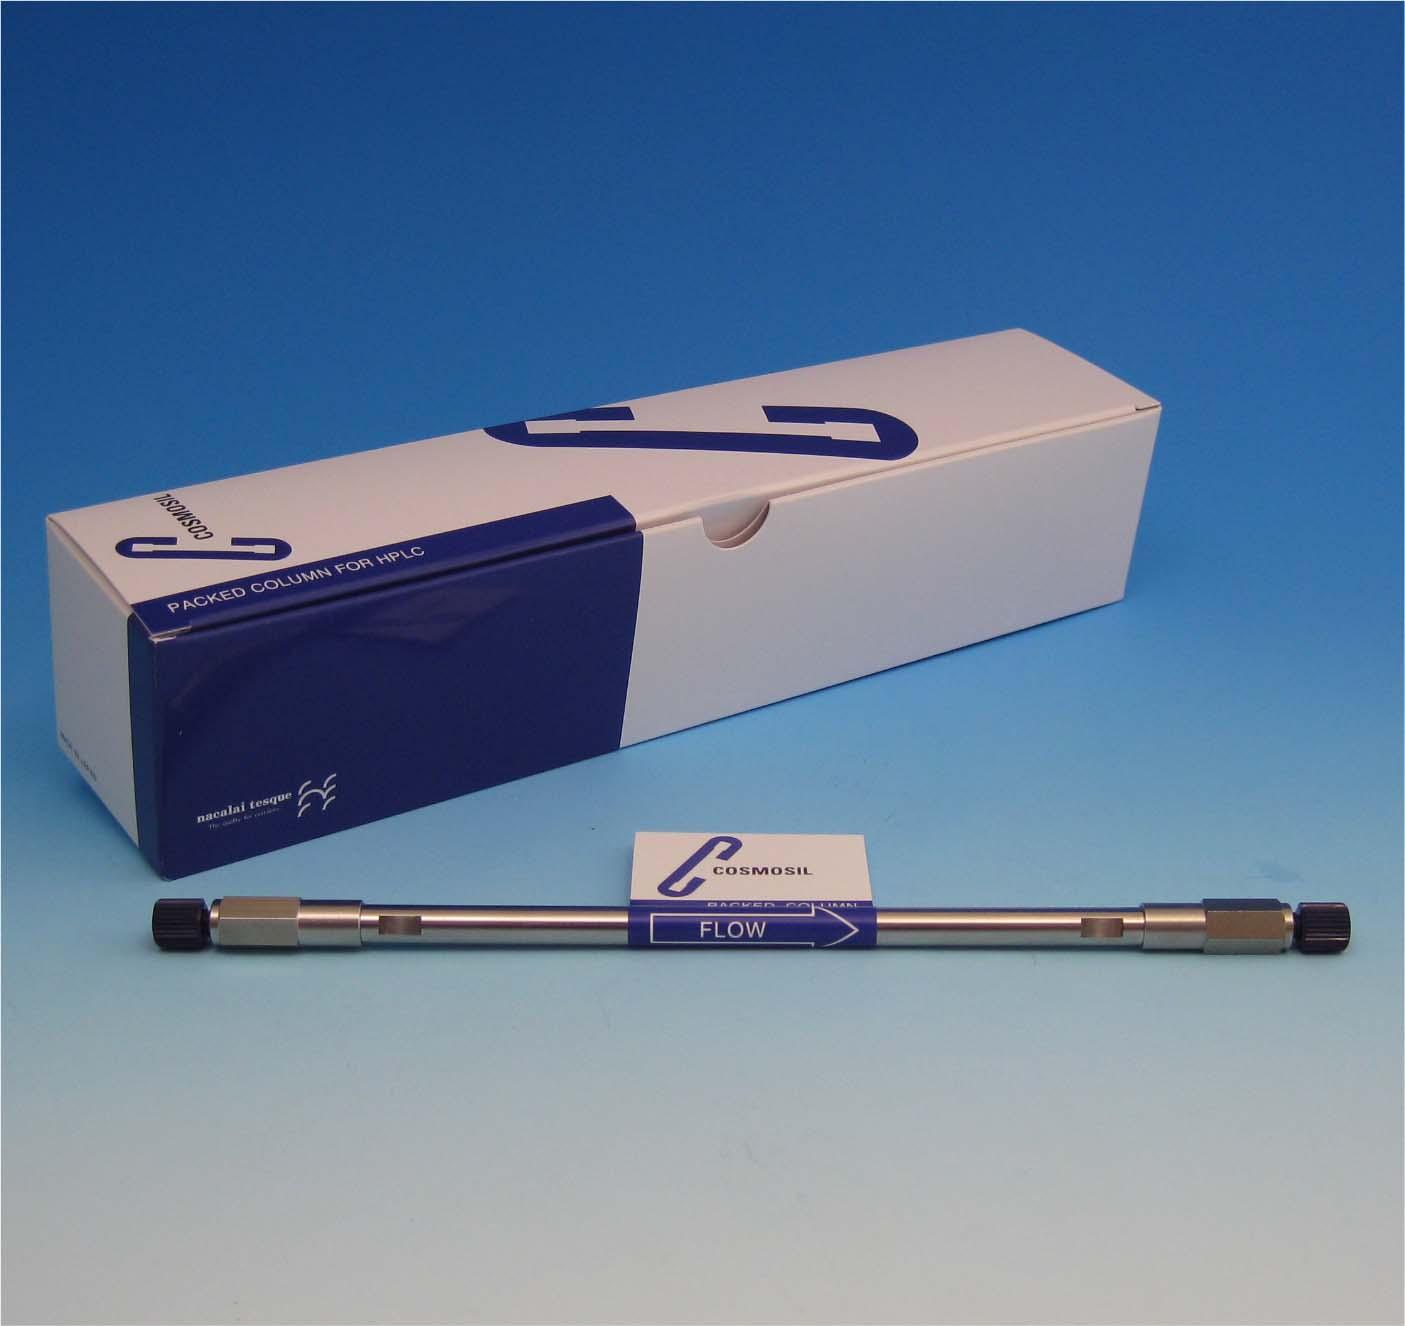 COSMOSIL(R) 5C18-AR-Ⅱ Packed Column 1.0mmI.D.x150mm